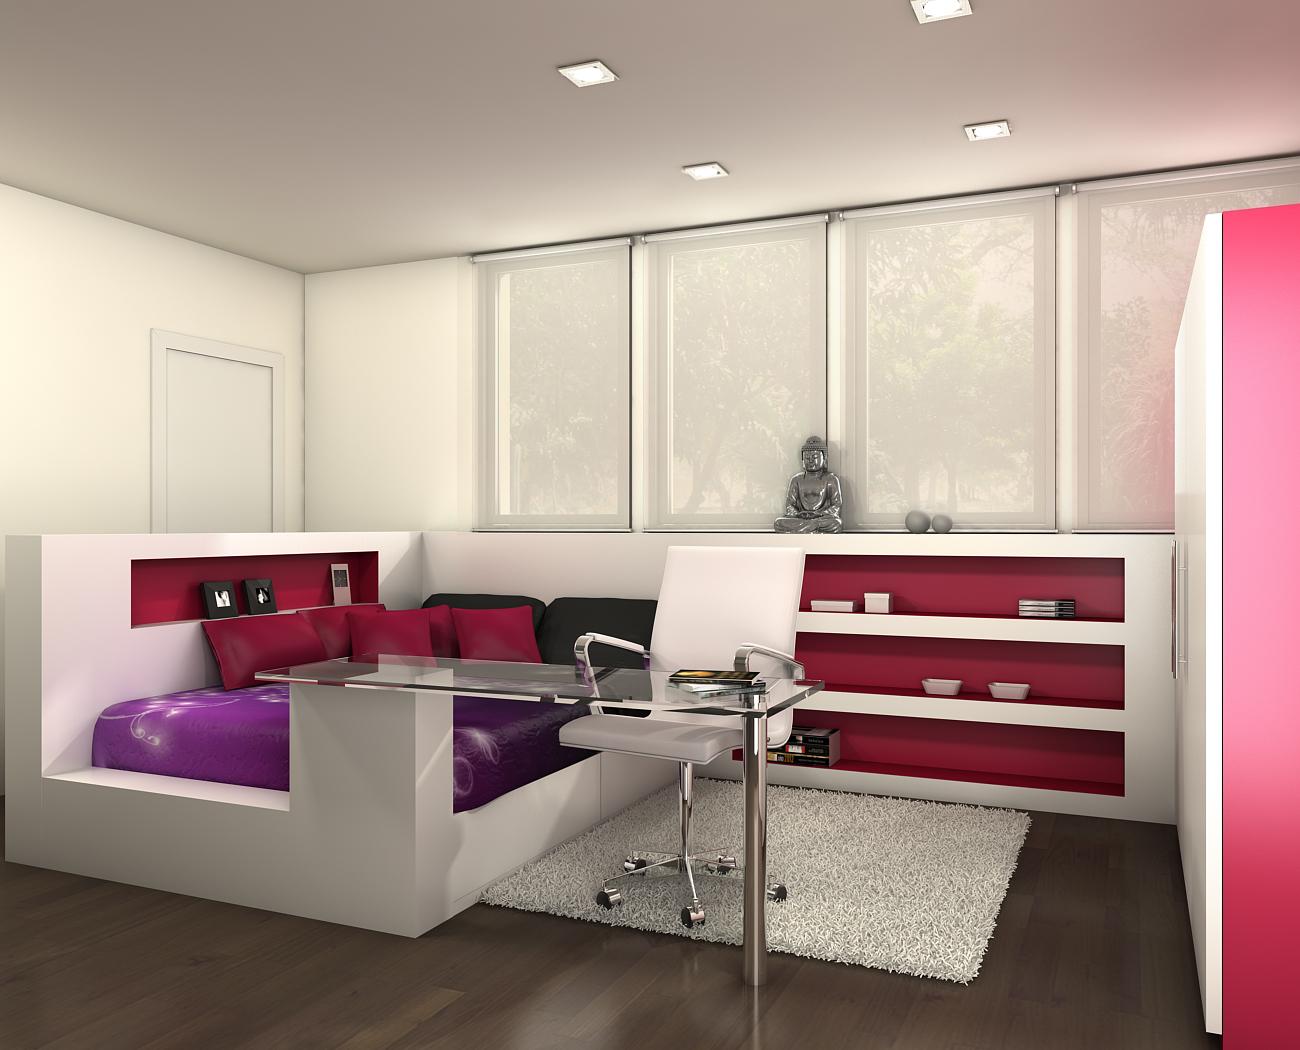 Atrezzo 3d habitaciones juveniles for Habitaciones modulares juveniles